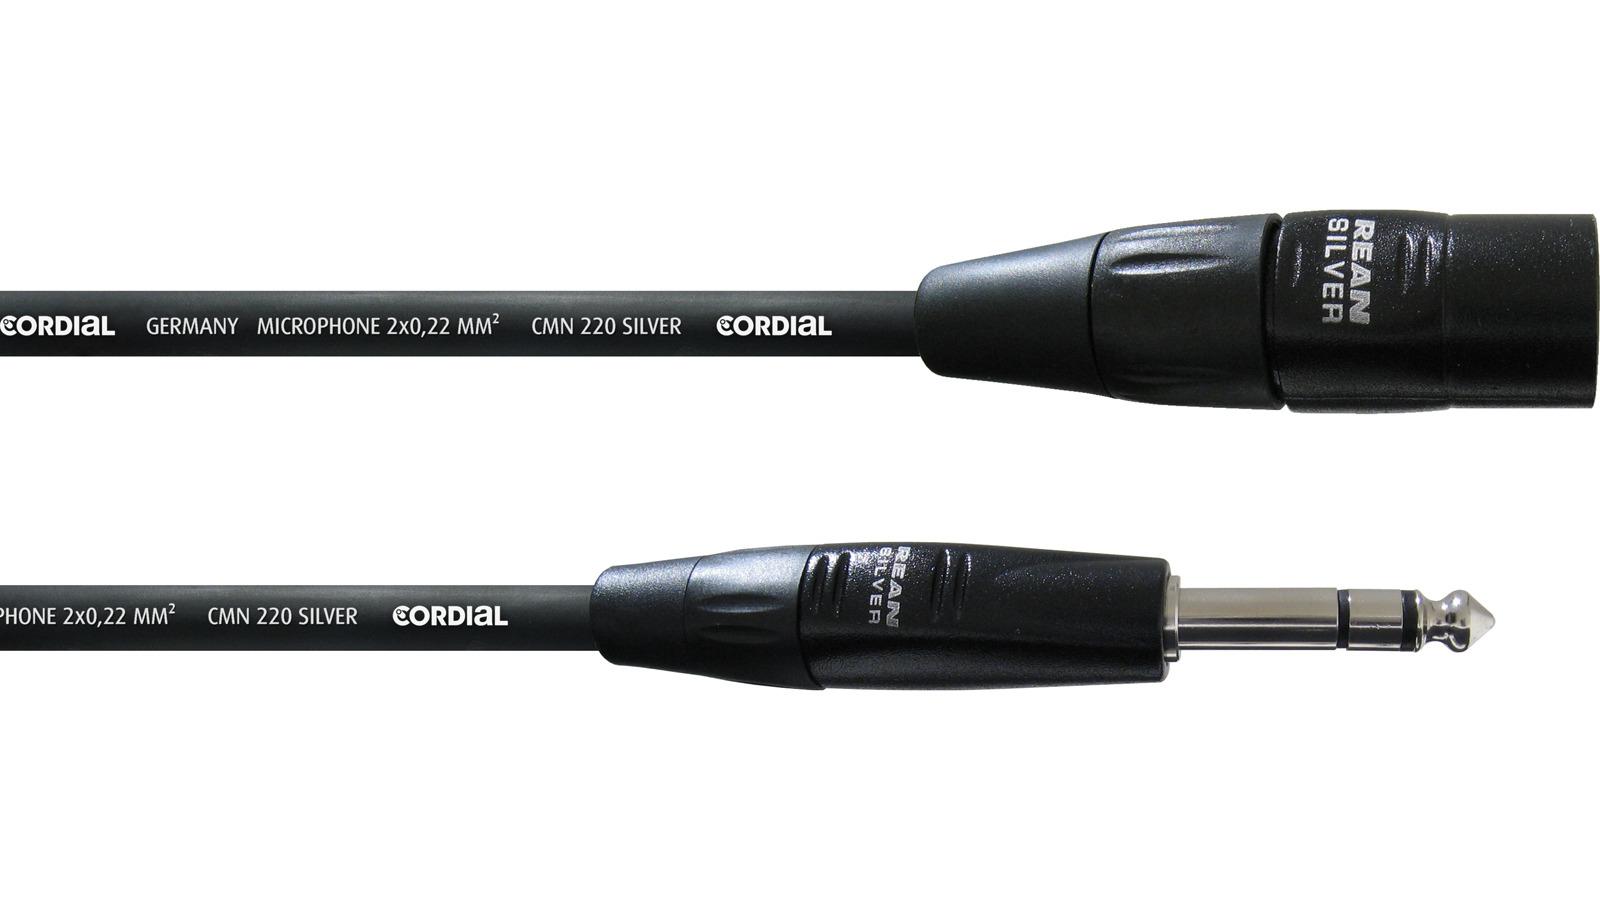 Cordial CIM 6 MV symmetrisches Kabel Klinke-XLR 6 m